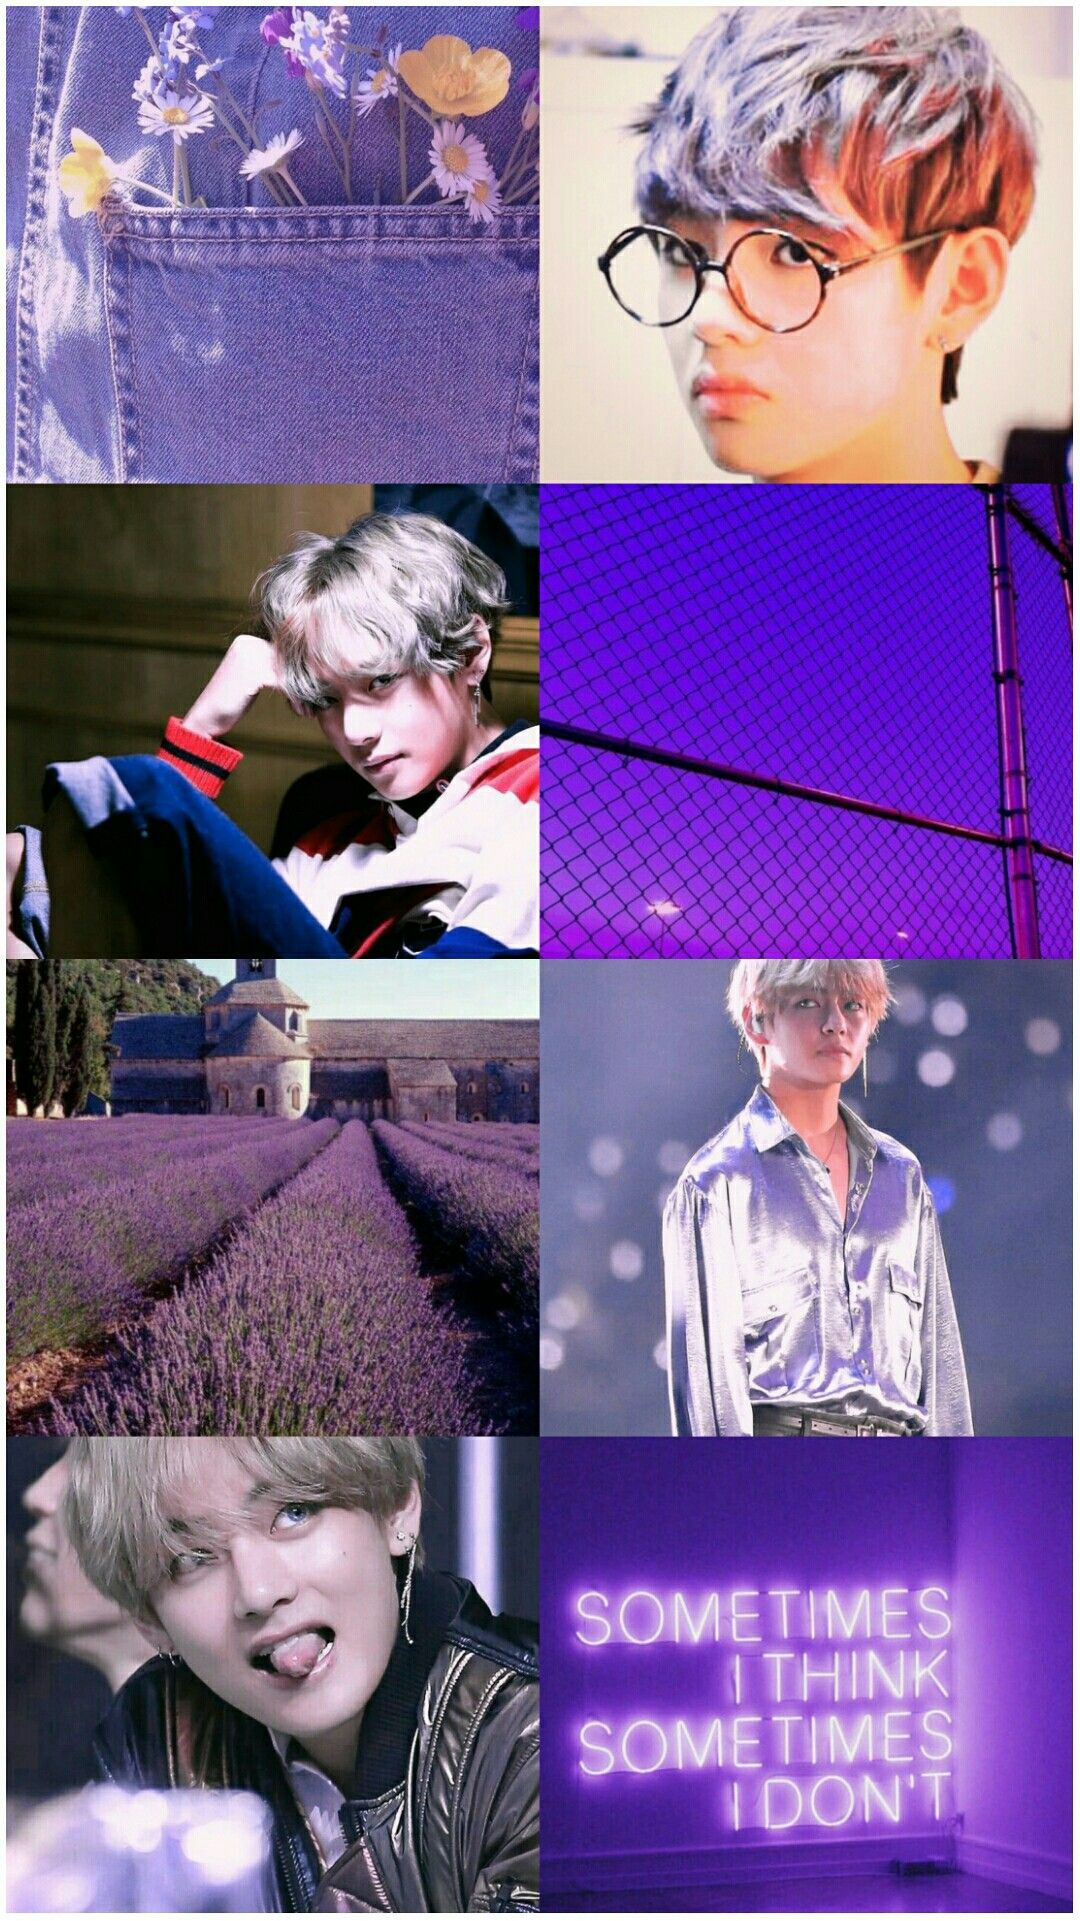 Bts V Kim Taehyung Purple Aesthetic Wallpaper Purple Aesthetic Bts V Aesthetic Wallpapers